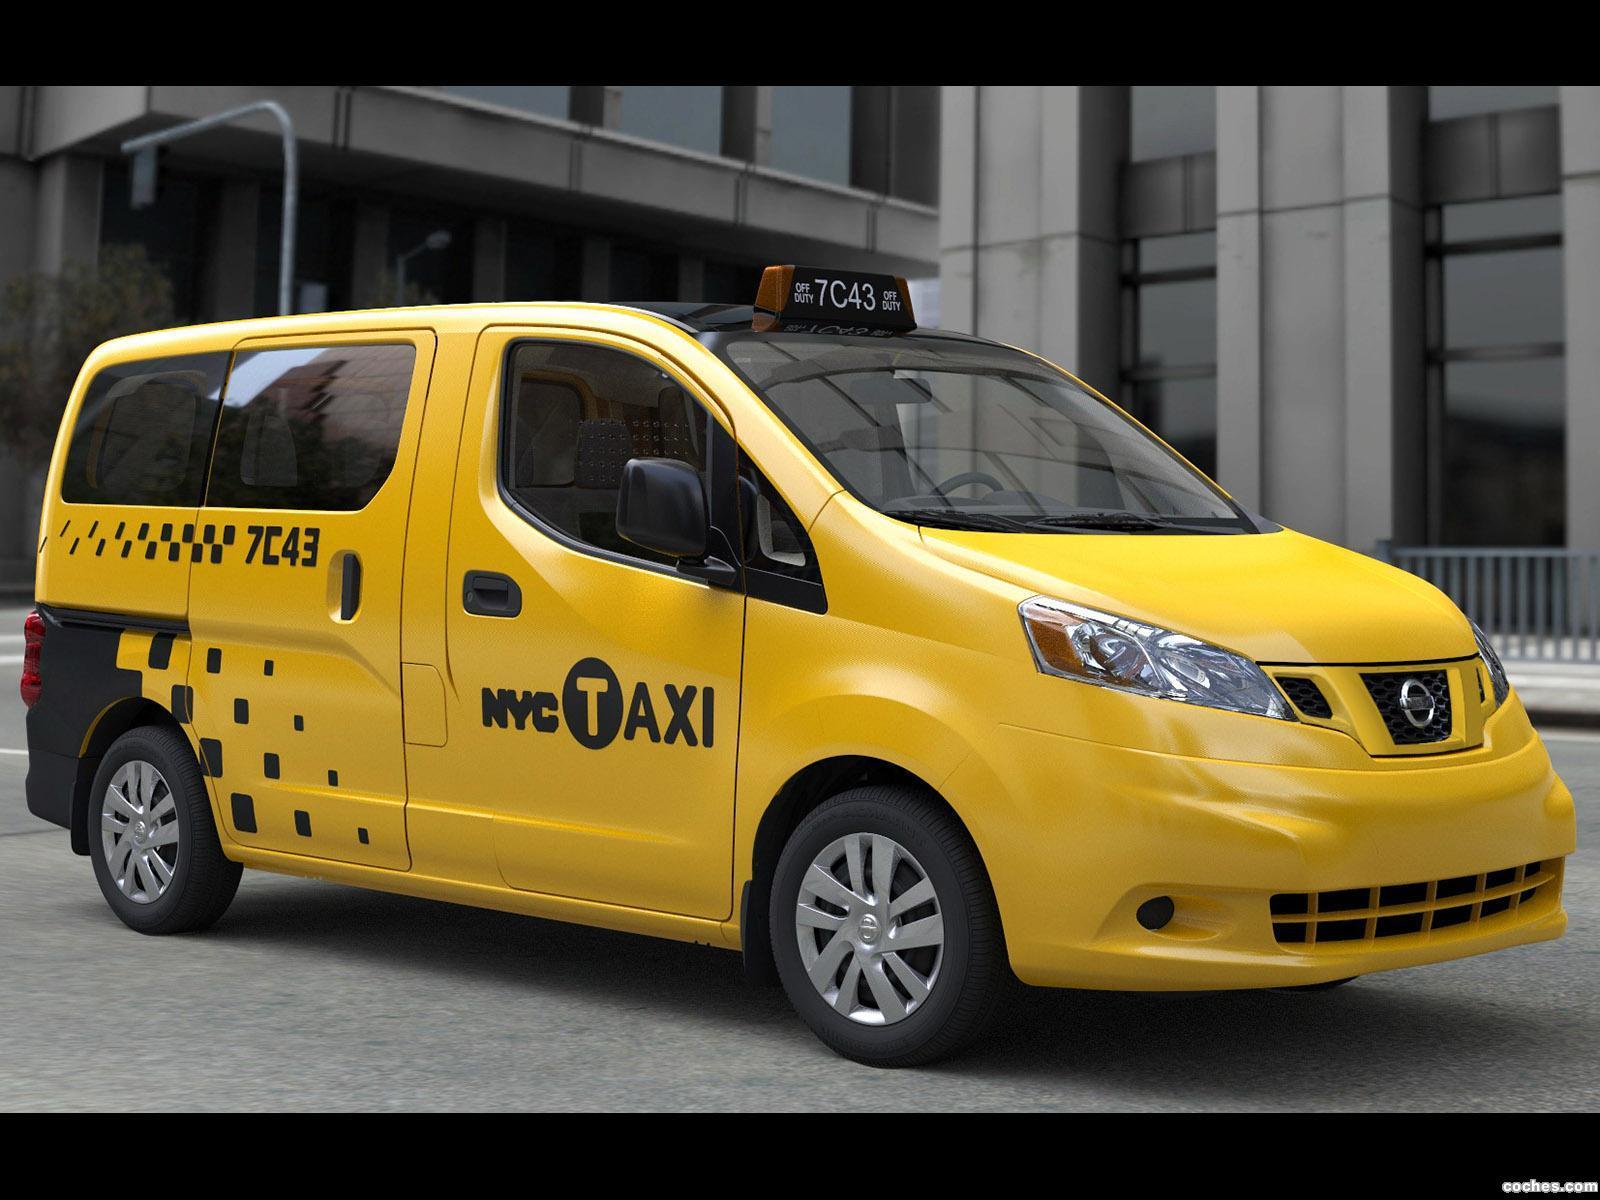 nissan_nv200-nyc-taxi-2011_r3